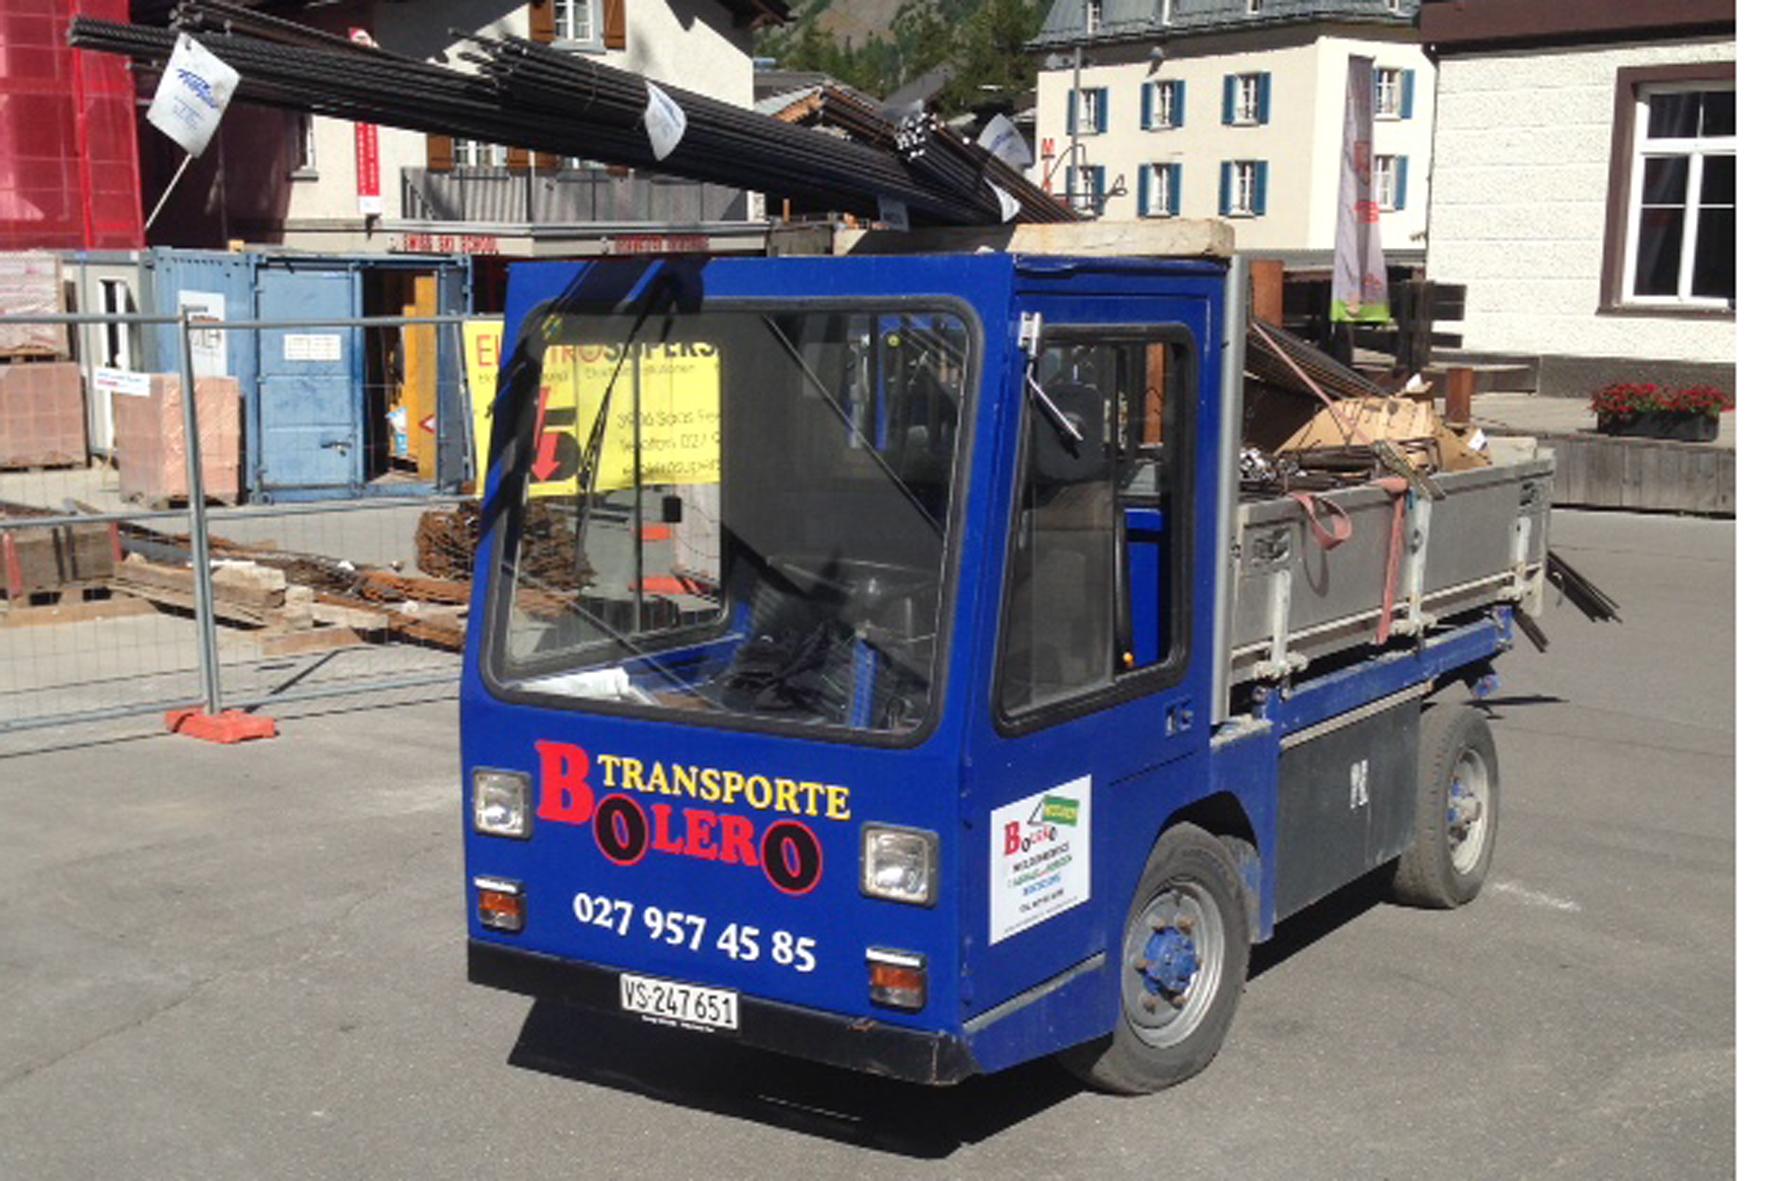 Transporte Garage Bolero Saas Fee